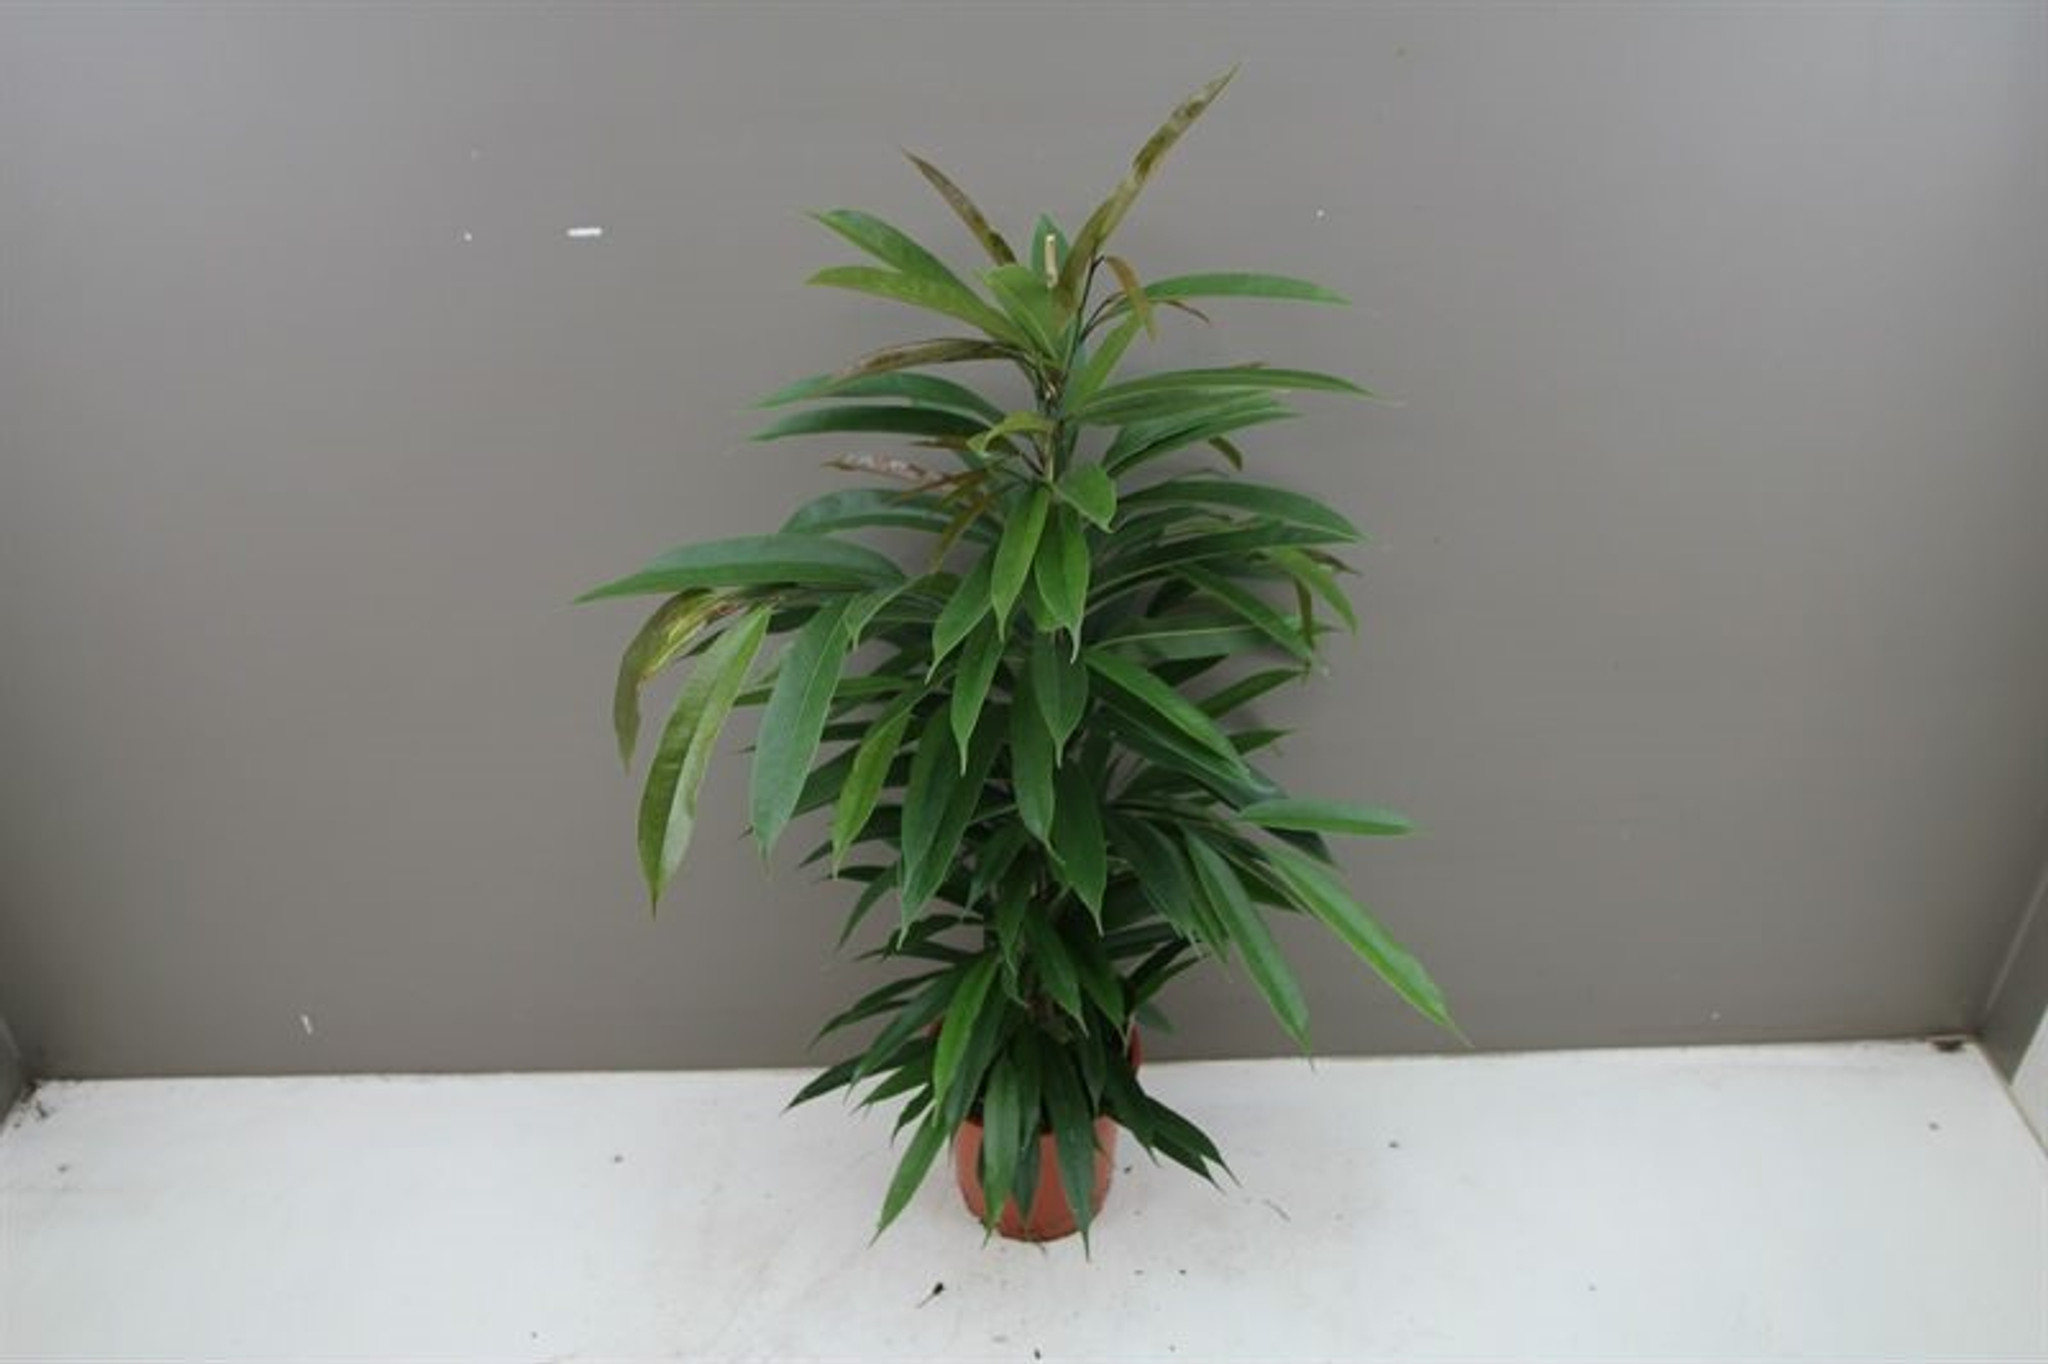 Bushy indoor tree